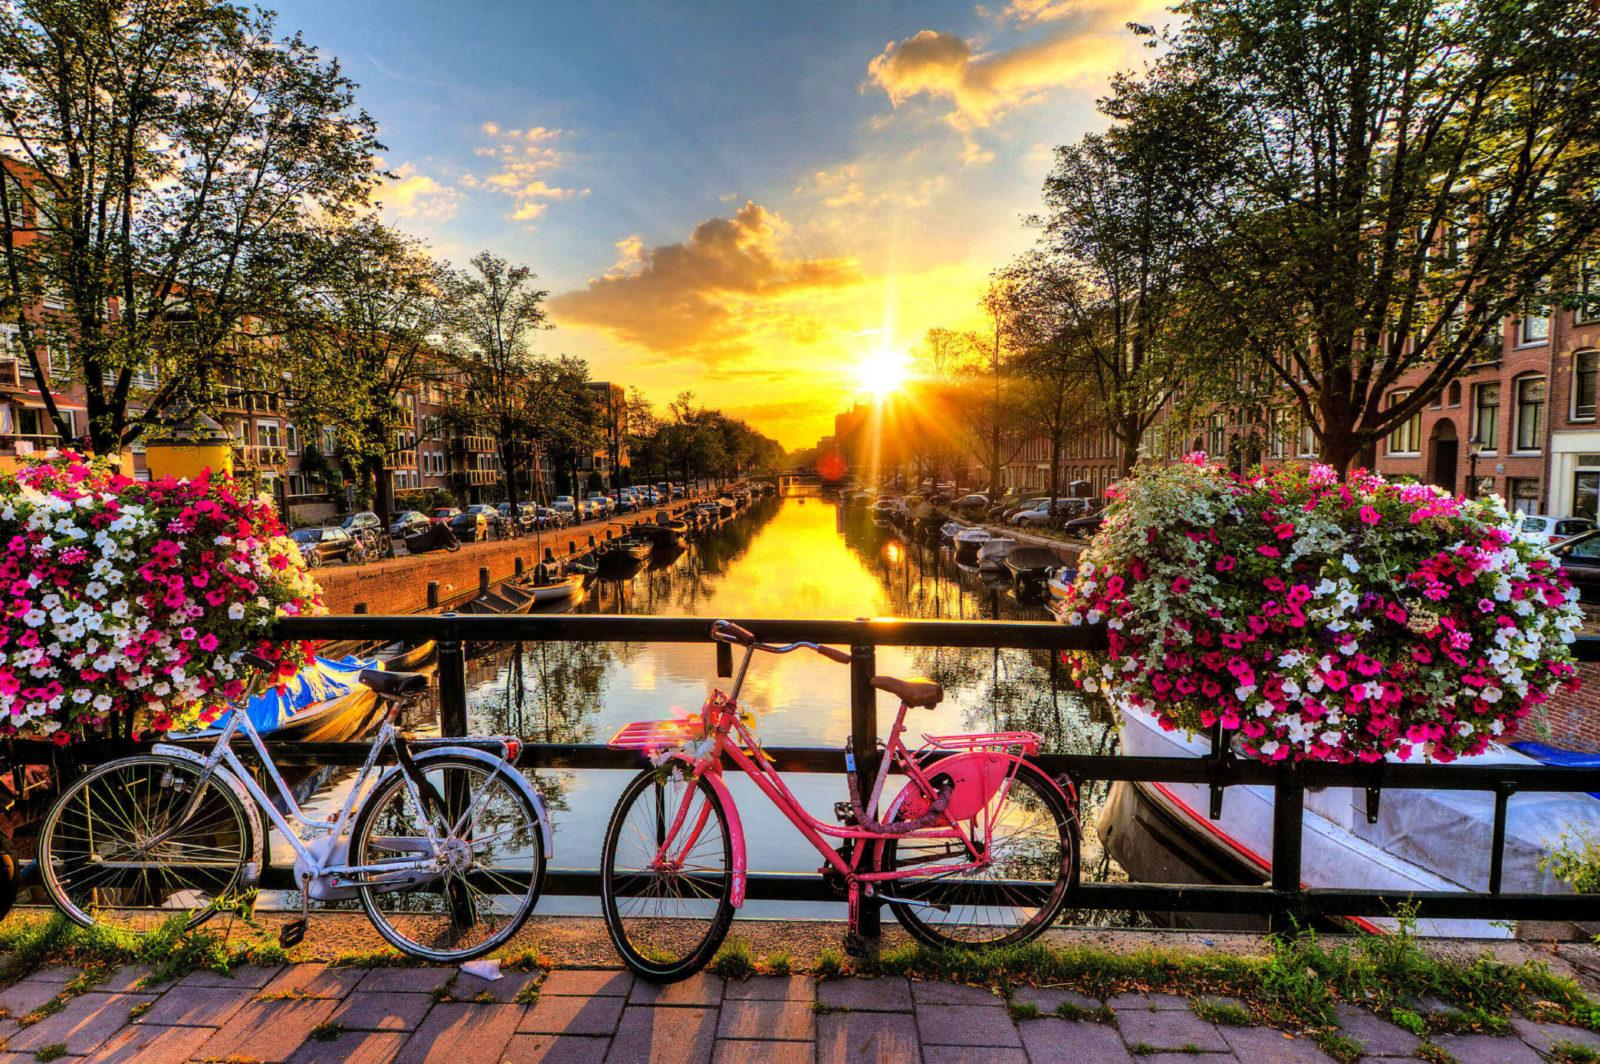 Amsterdam scaled - ავიაბილეთები ამსტერდამი